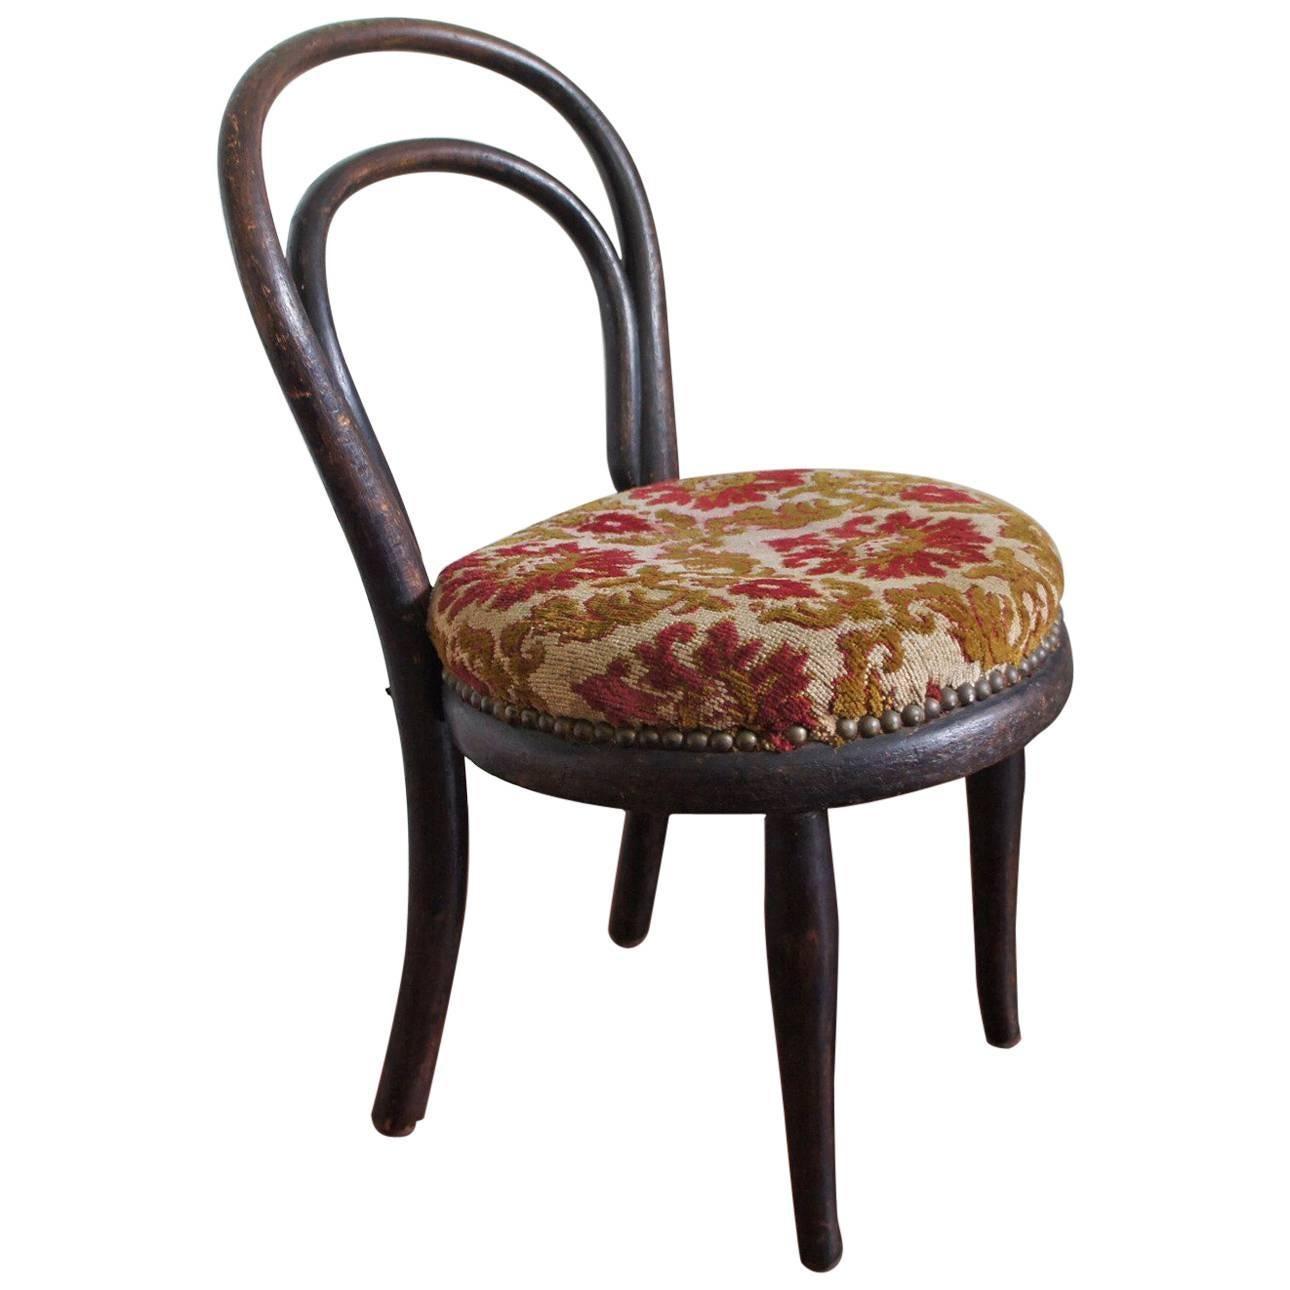 Rare and Original Antique Bentwood Thonet Child's Chair 19th Century Furniture